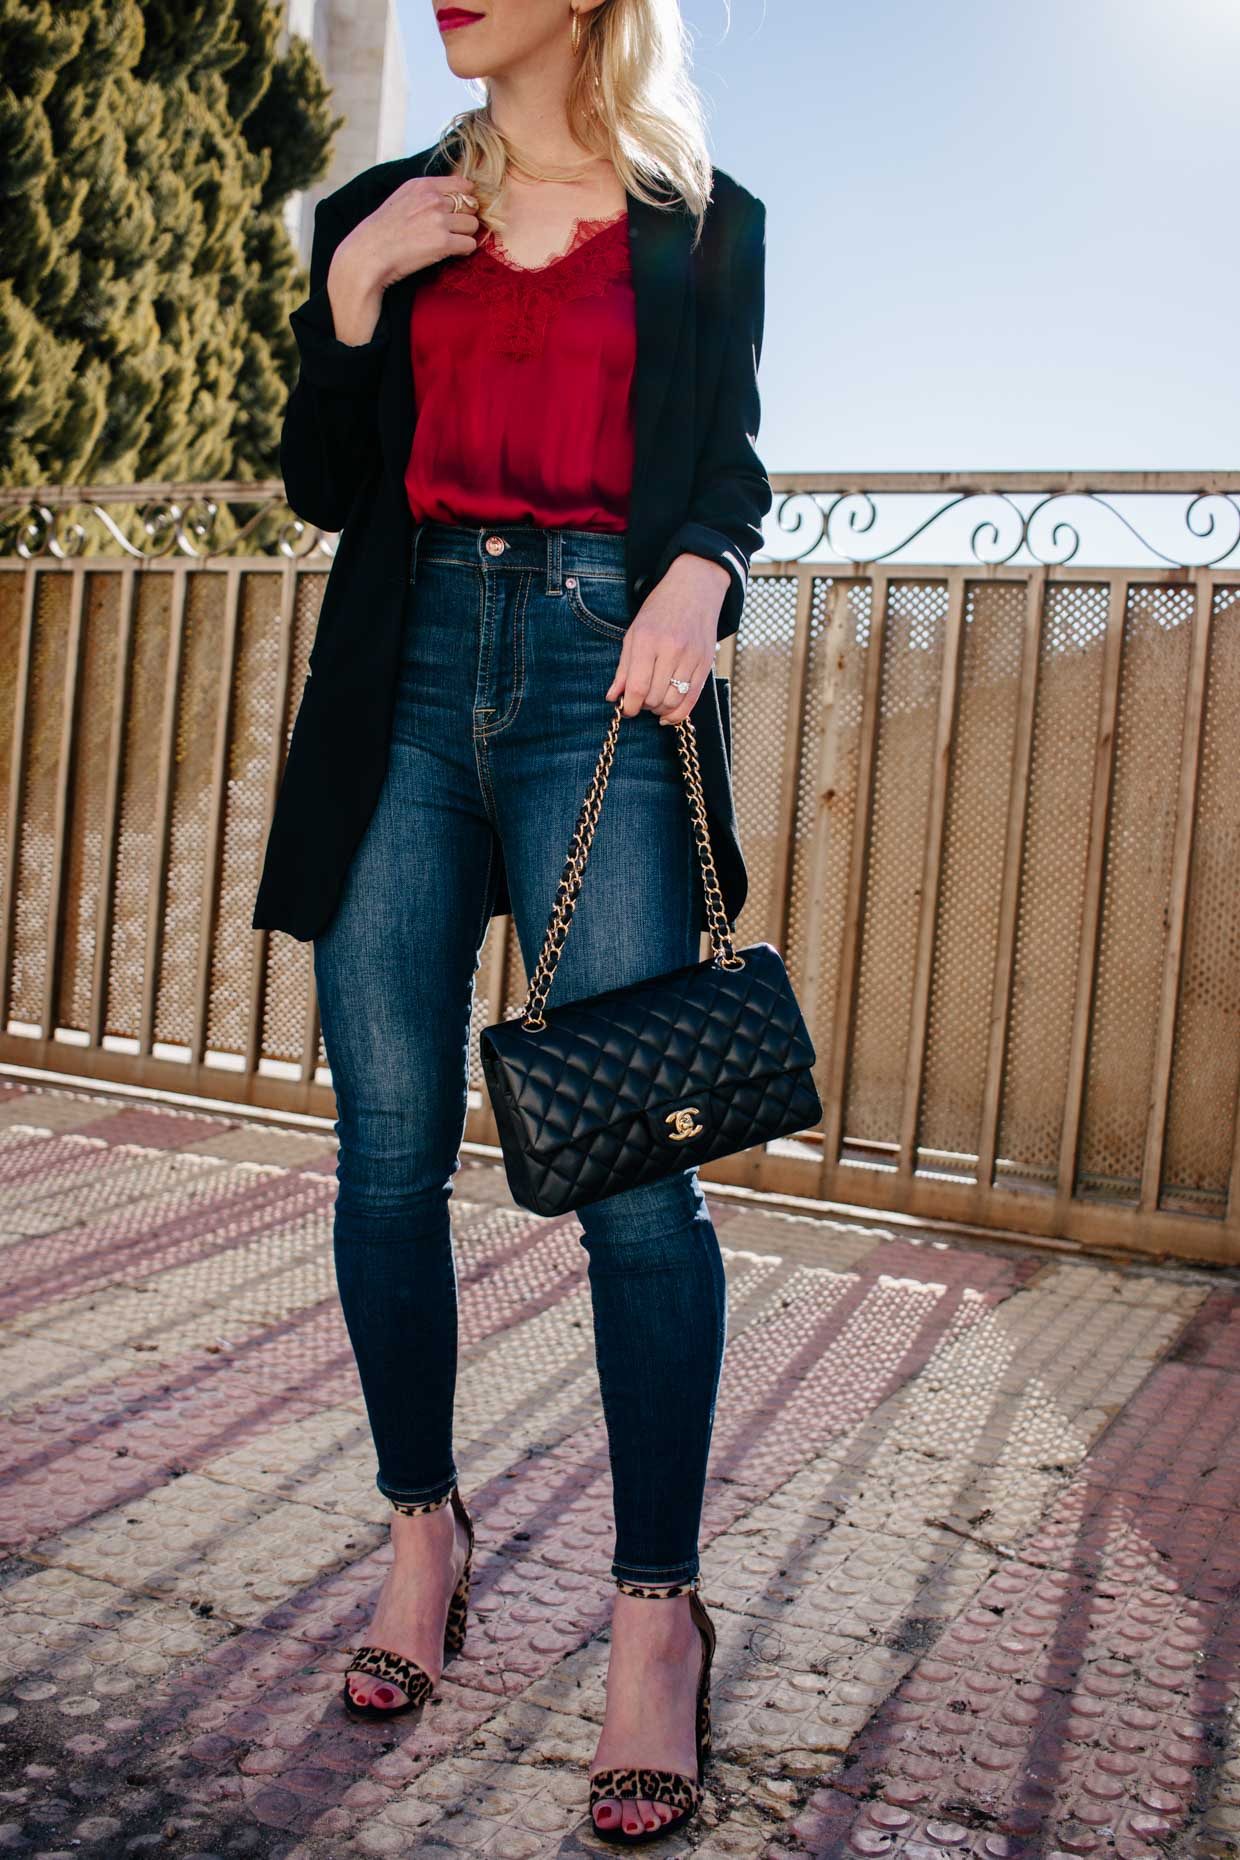 b41ff34198b6 Meagan Brandon fashion blogger of Meagan s Moda wears long black blazer  with red lace camisole